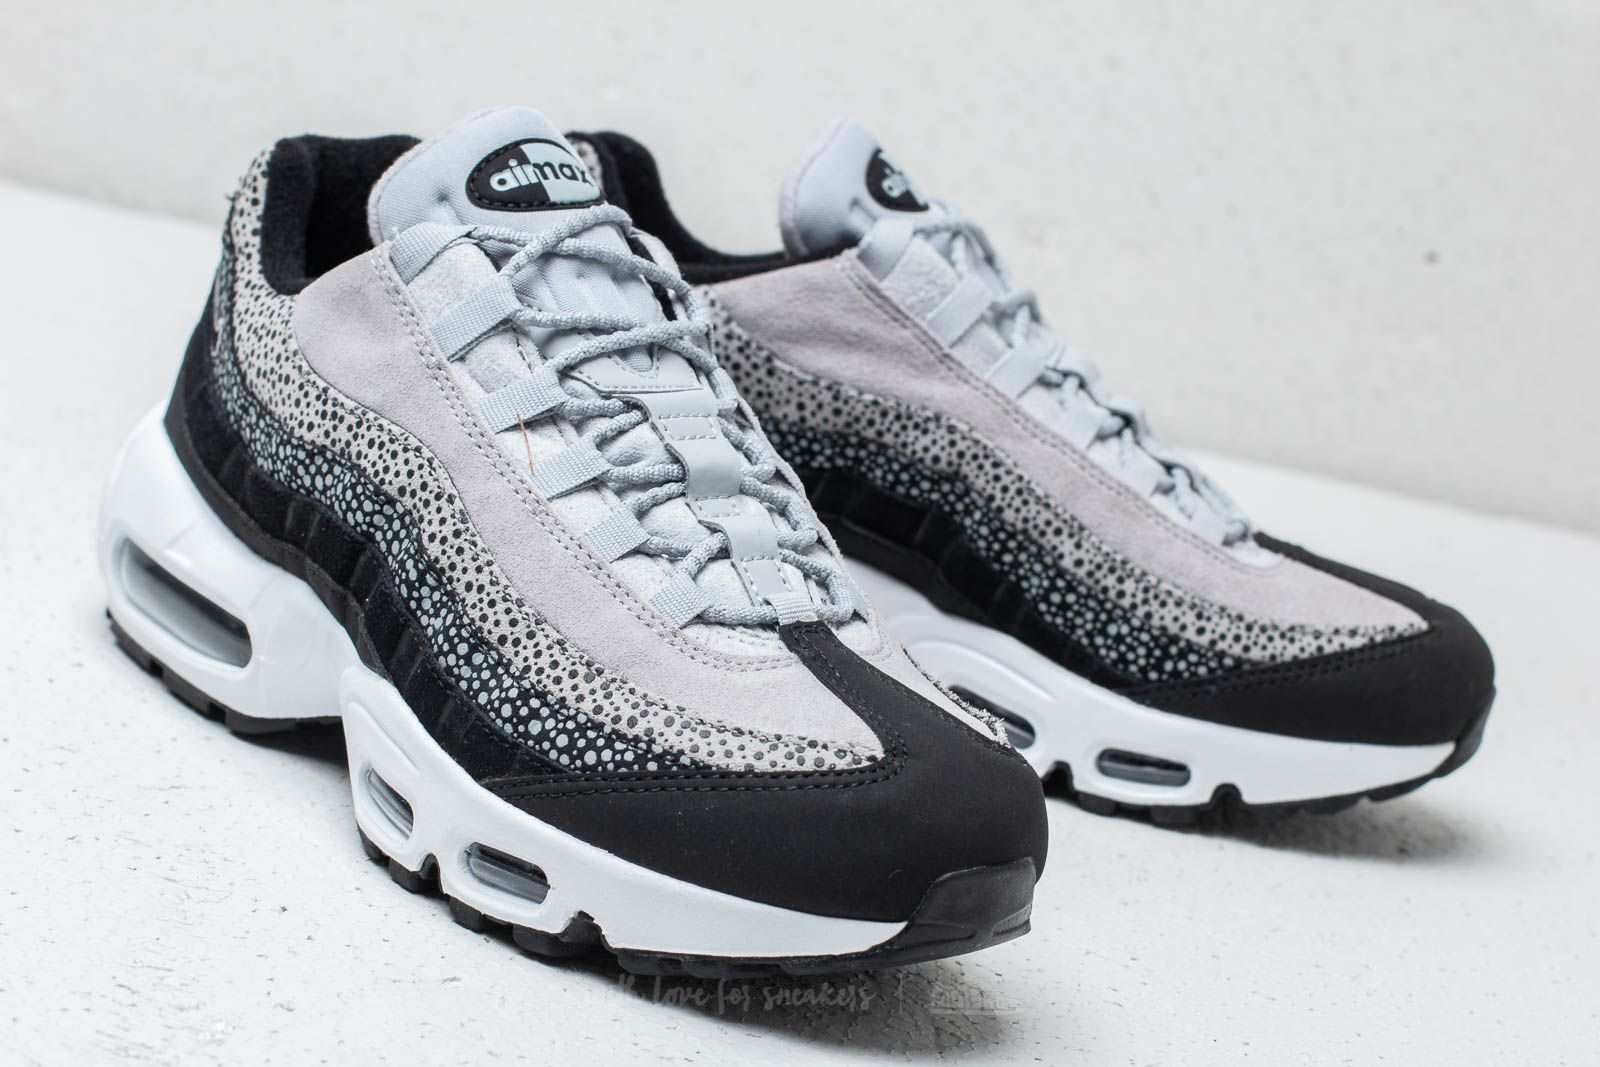 Nike Wmns Air Max 95 Premium Black  Black-Wolf Grey-White at a 2be00021c